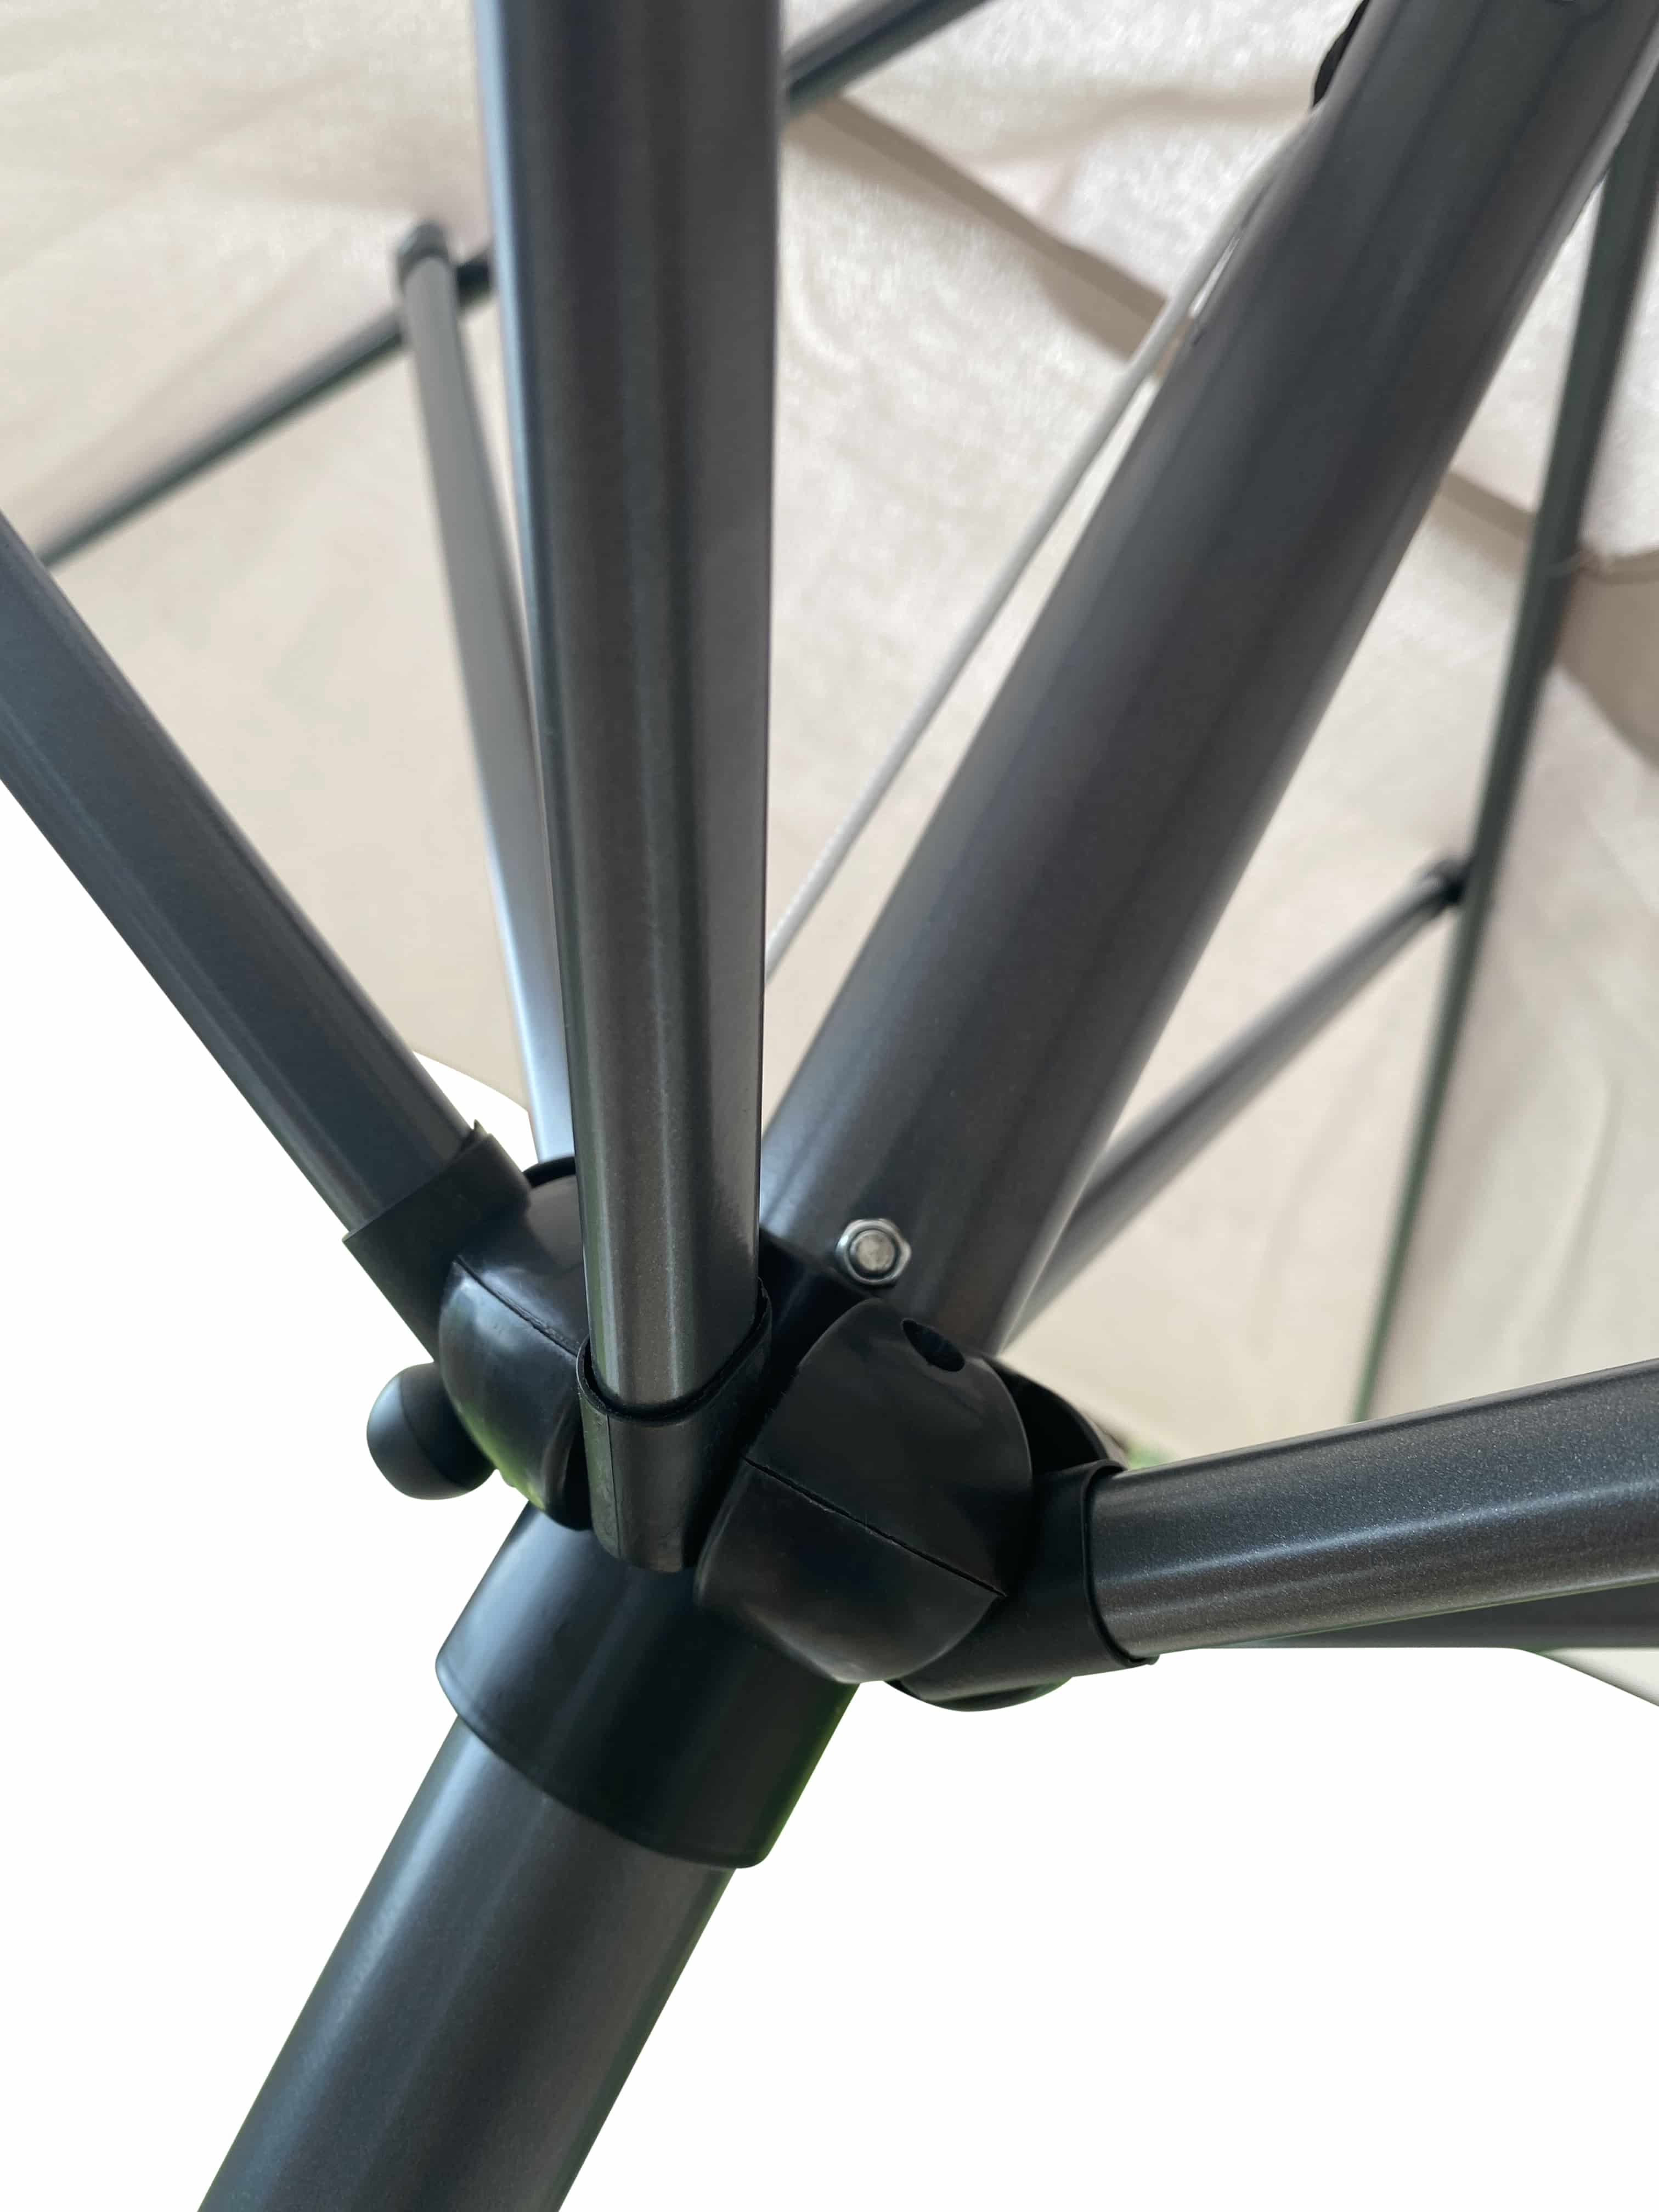 4Goodz balkonparasol 150X250CM met knikarm - Creme